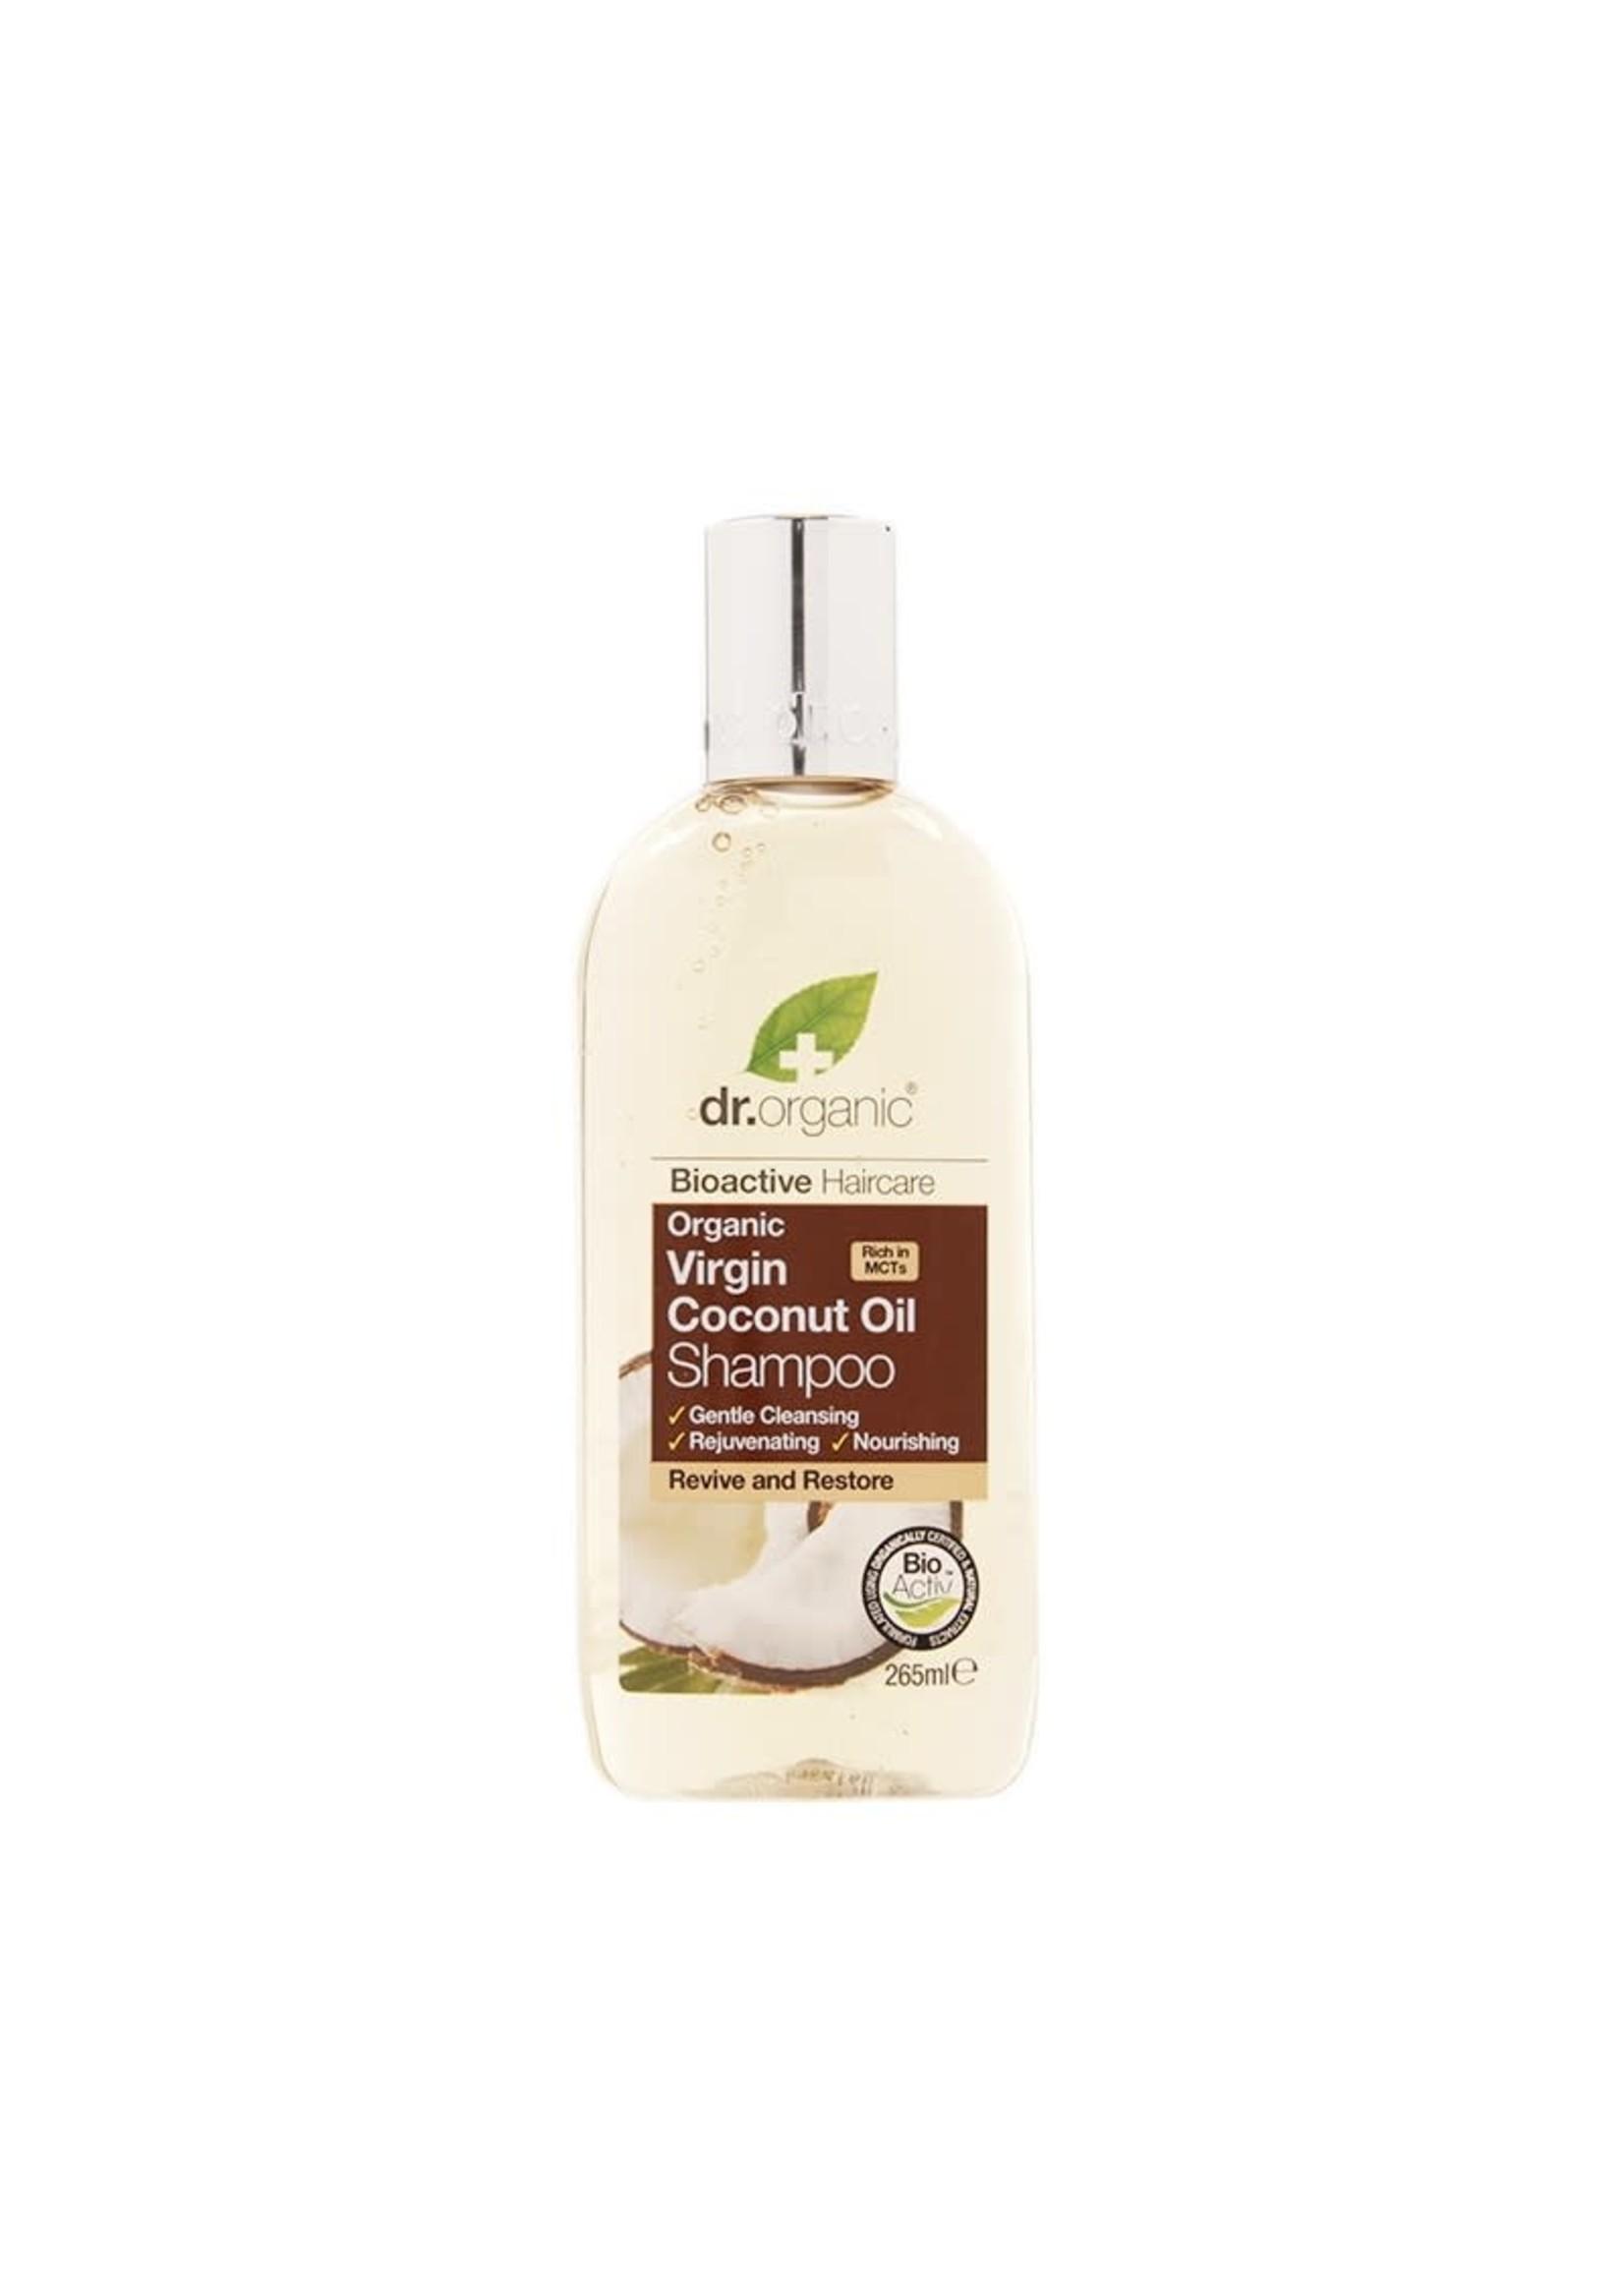 Dr Organic Dr Organic Virgin Coconut Oil Shampoo 265ml